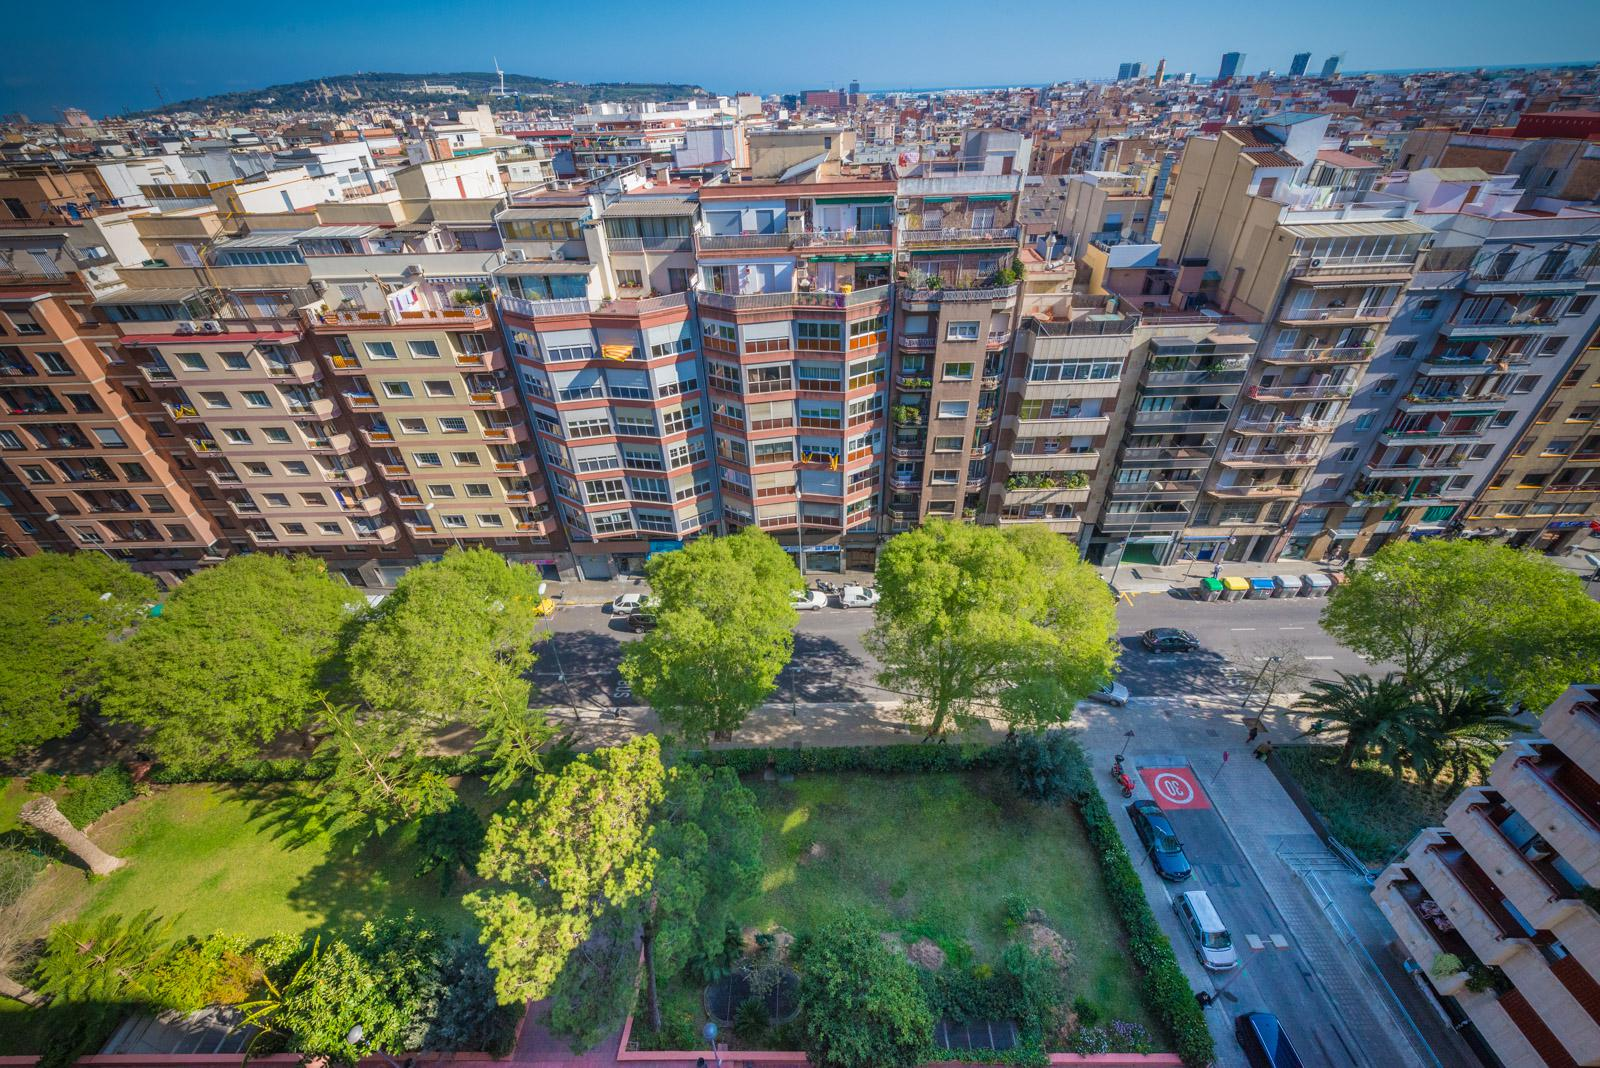 152882 - Travessera de les Corts - Camp Nou